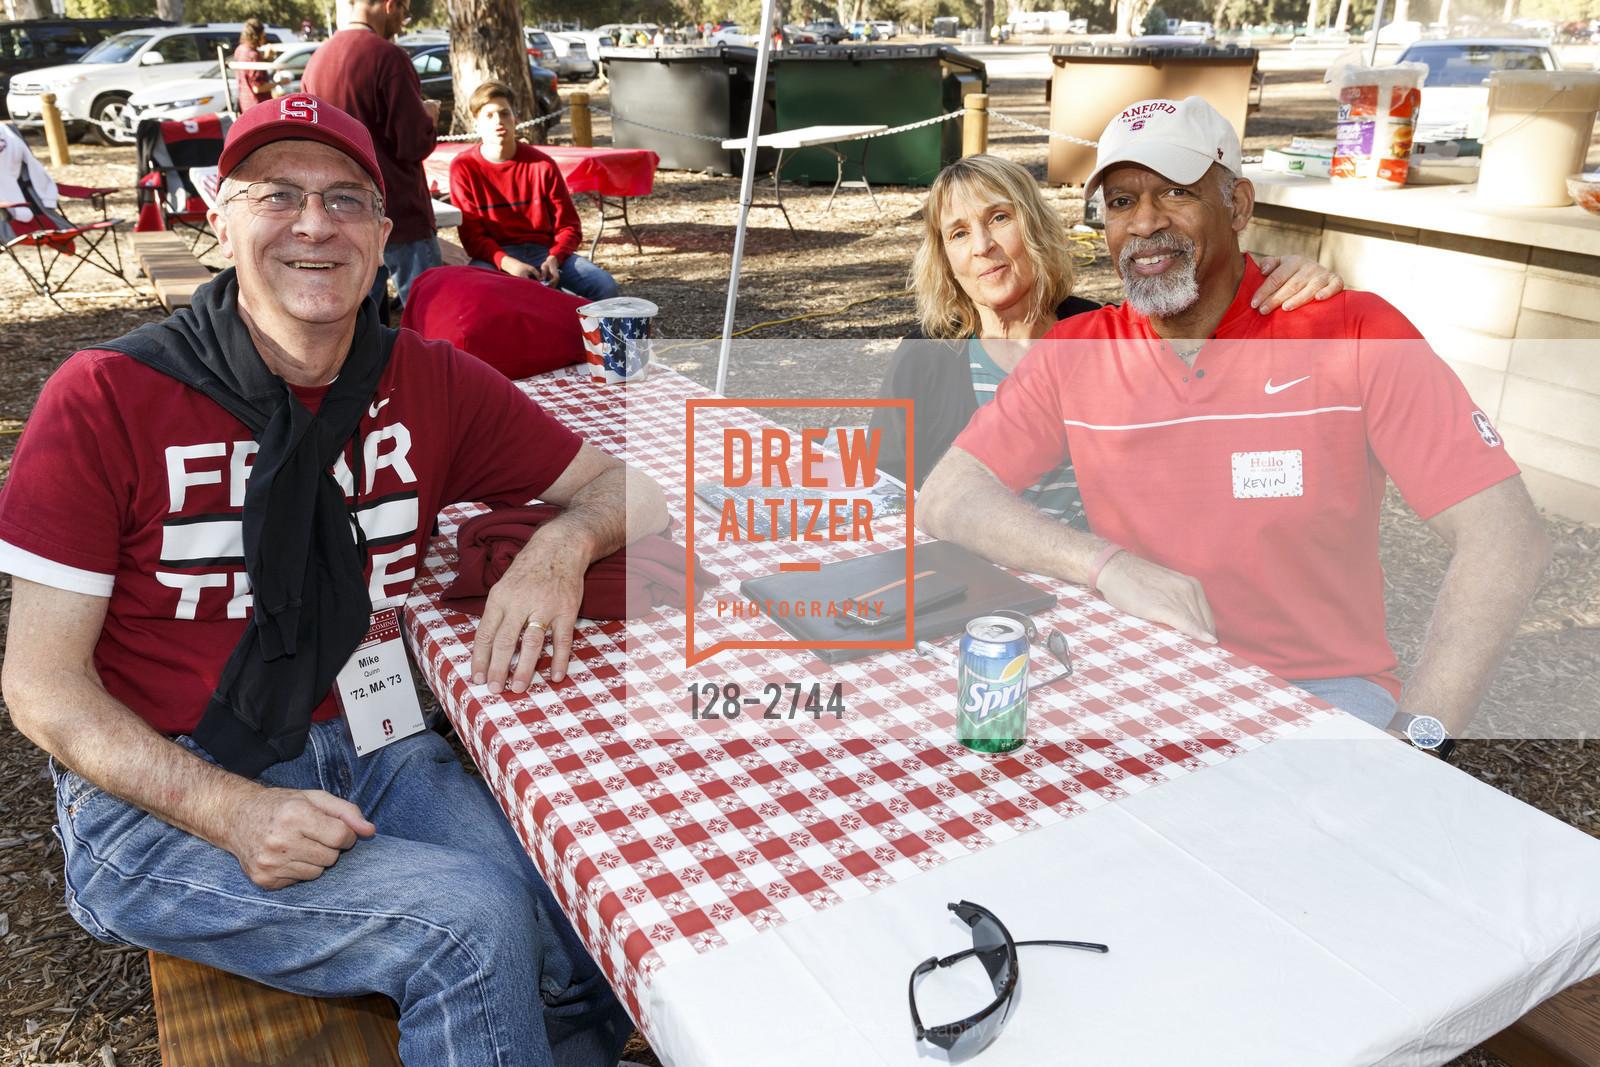 Mike Quinn, Molly Cohan, Kevin Washington, Photo #128-2744